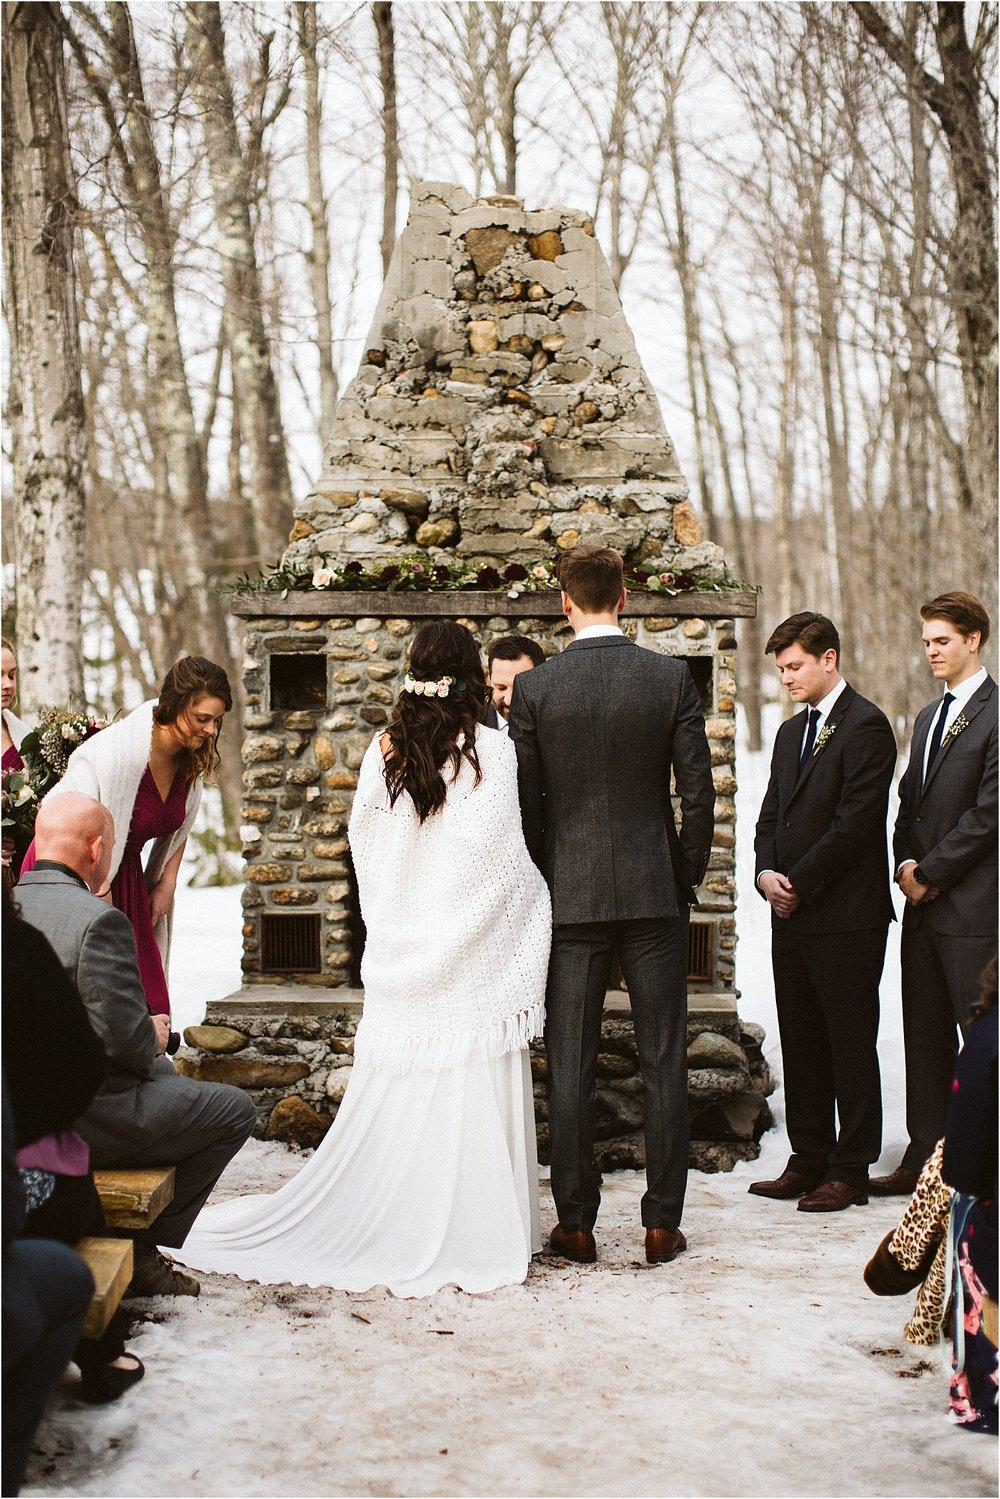 New Hampshire Winter Wedding_0028.jpg